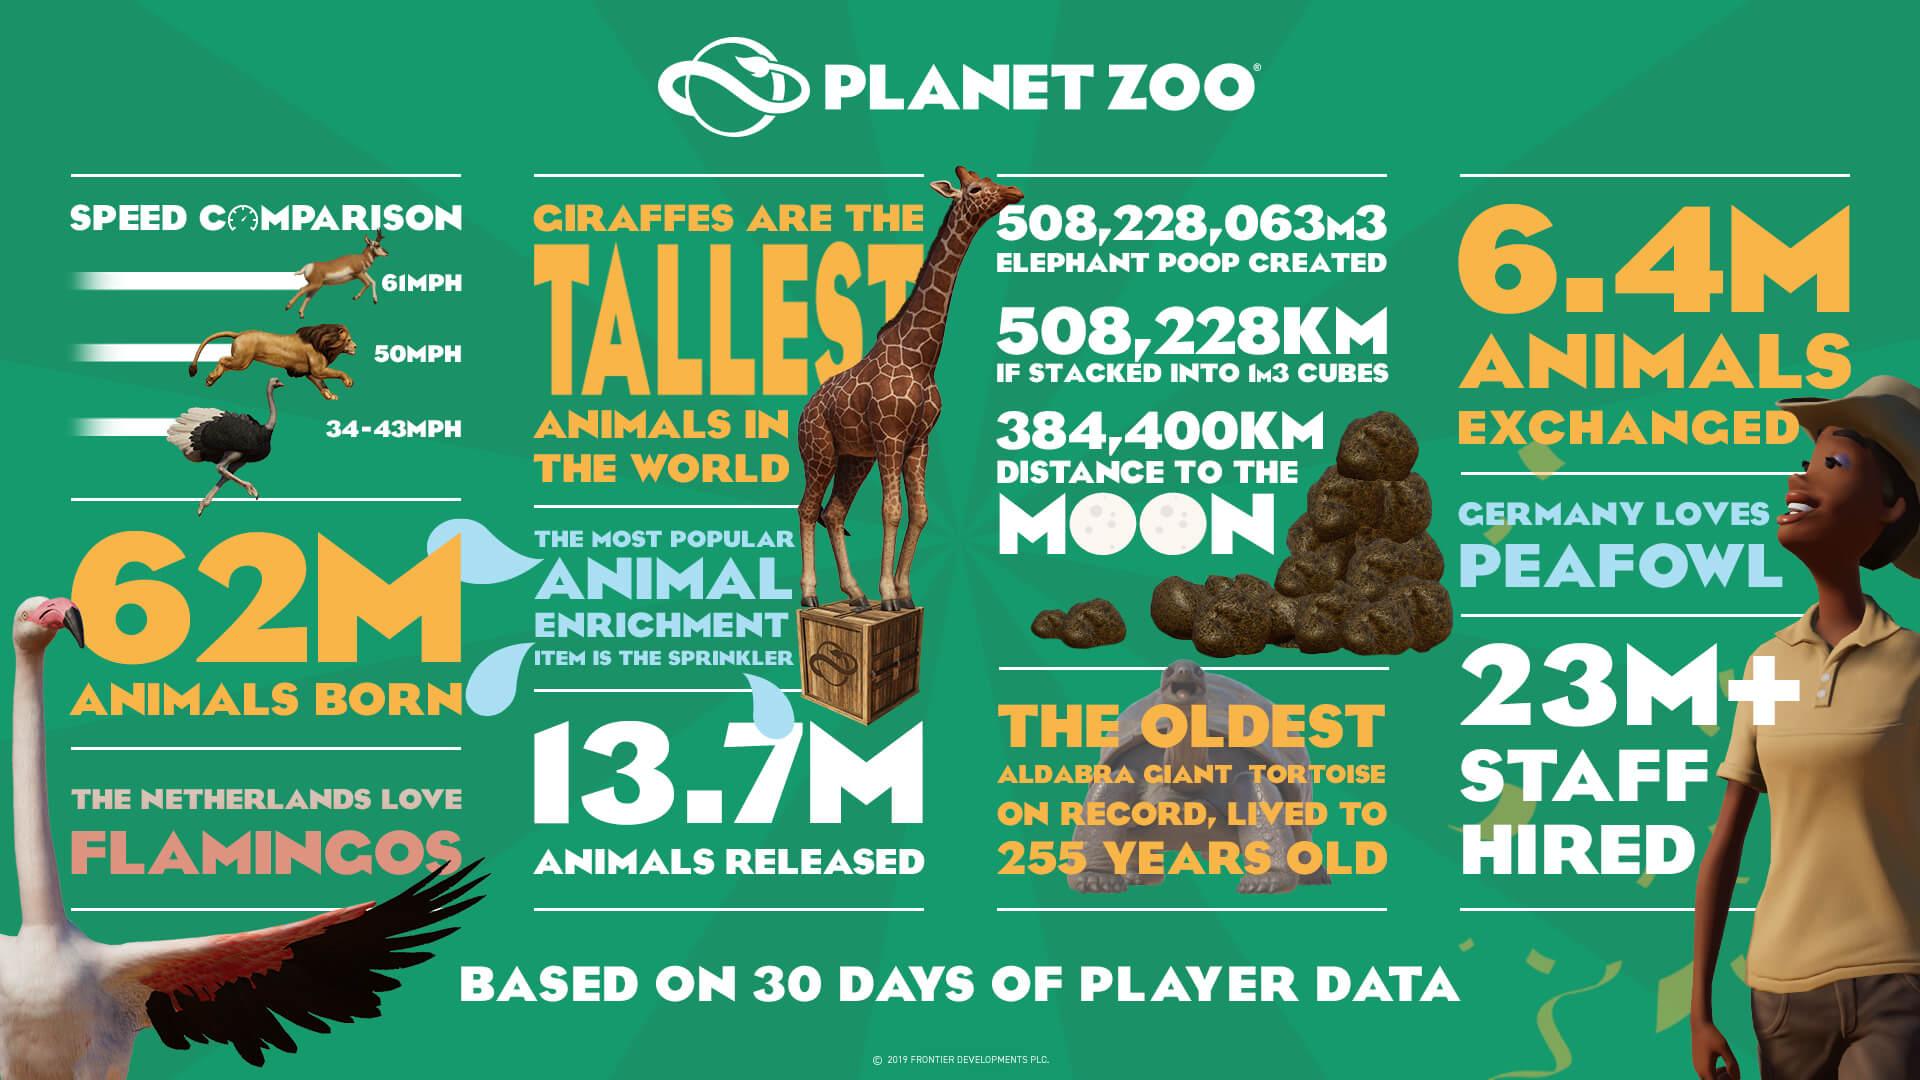 Pz Infographic 1920x1080